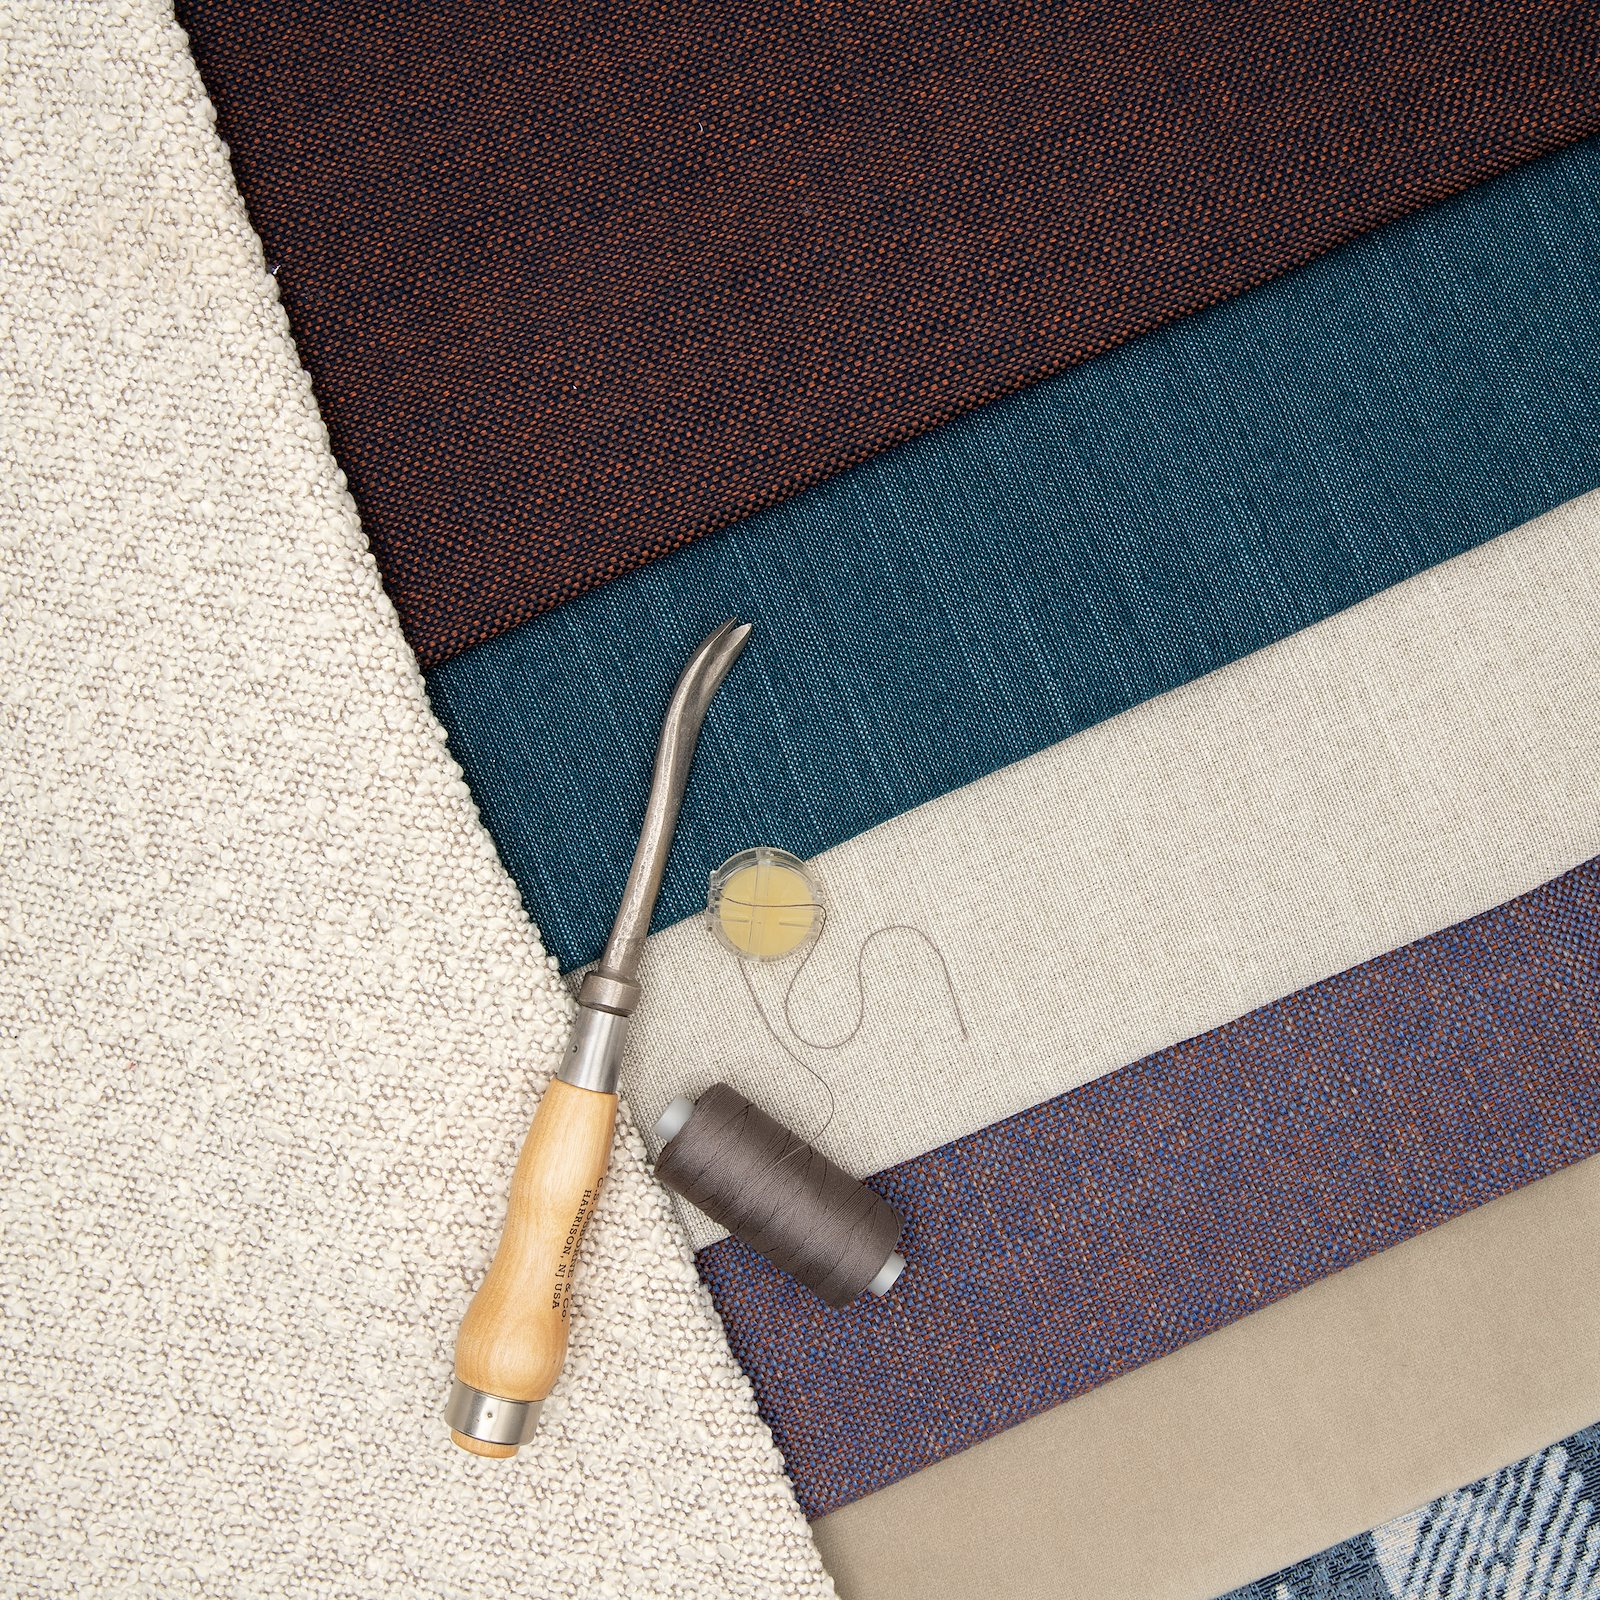 Upholstery boucle offwhite/putty melange 824161_824157_824153_824152_824156_824158_bundle